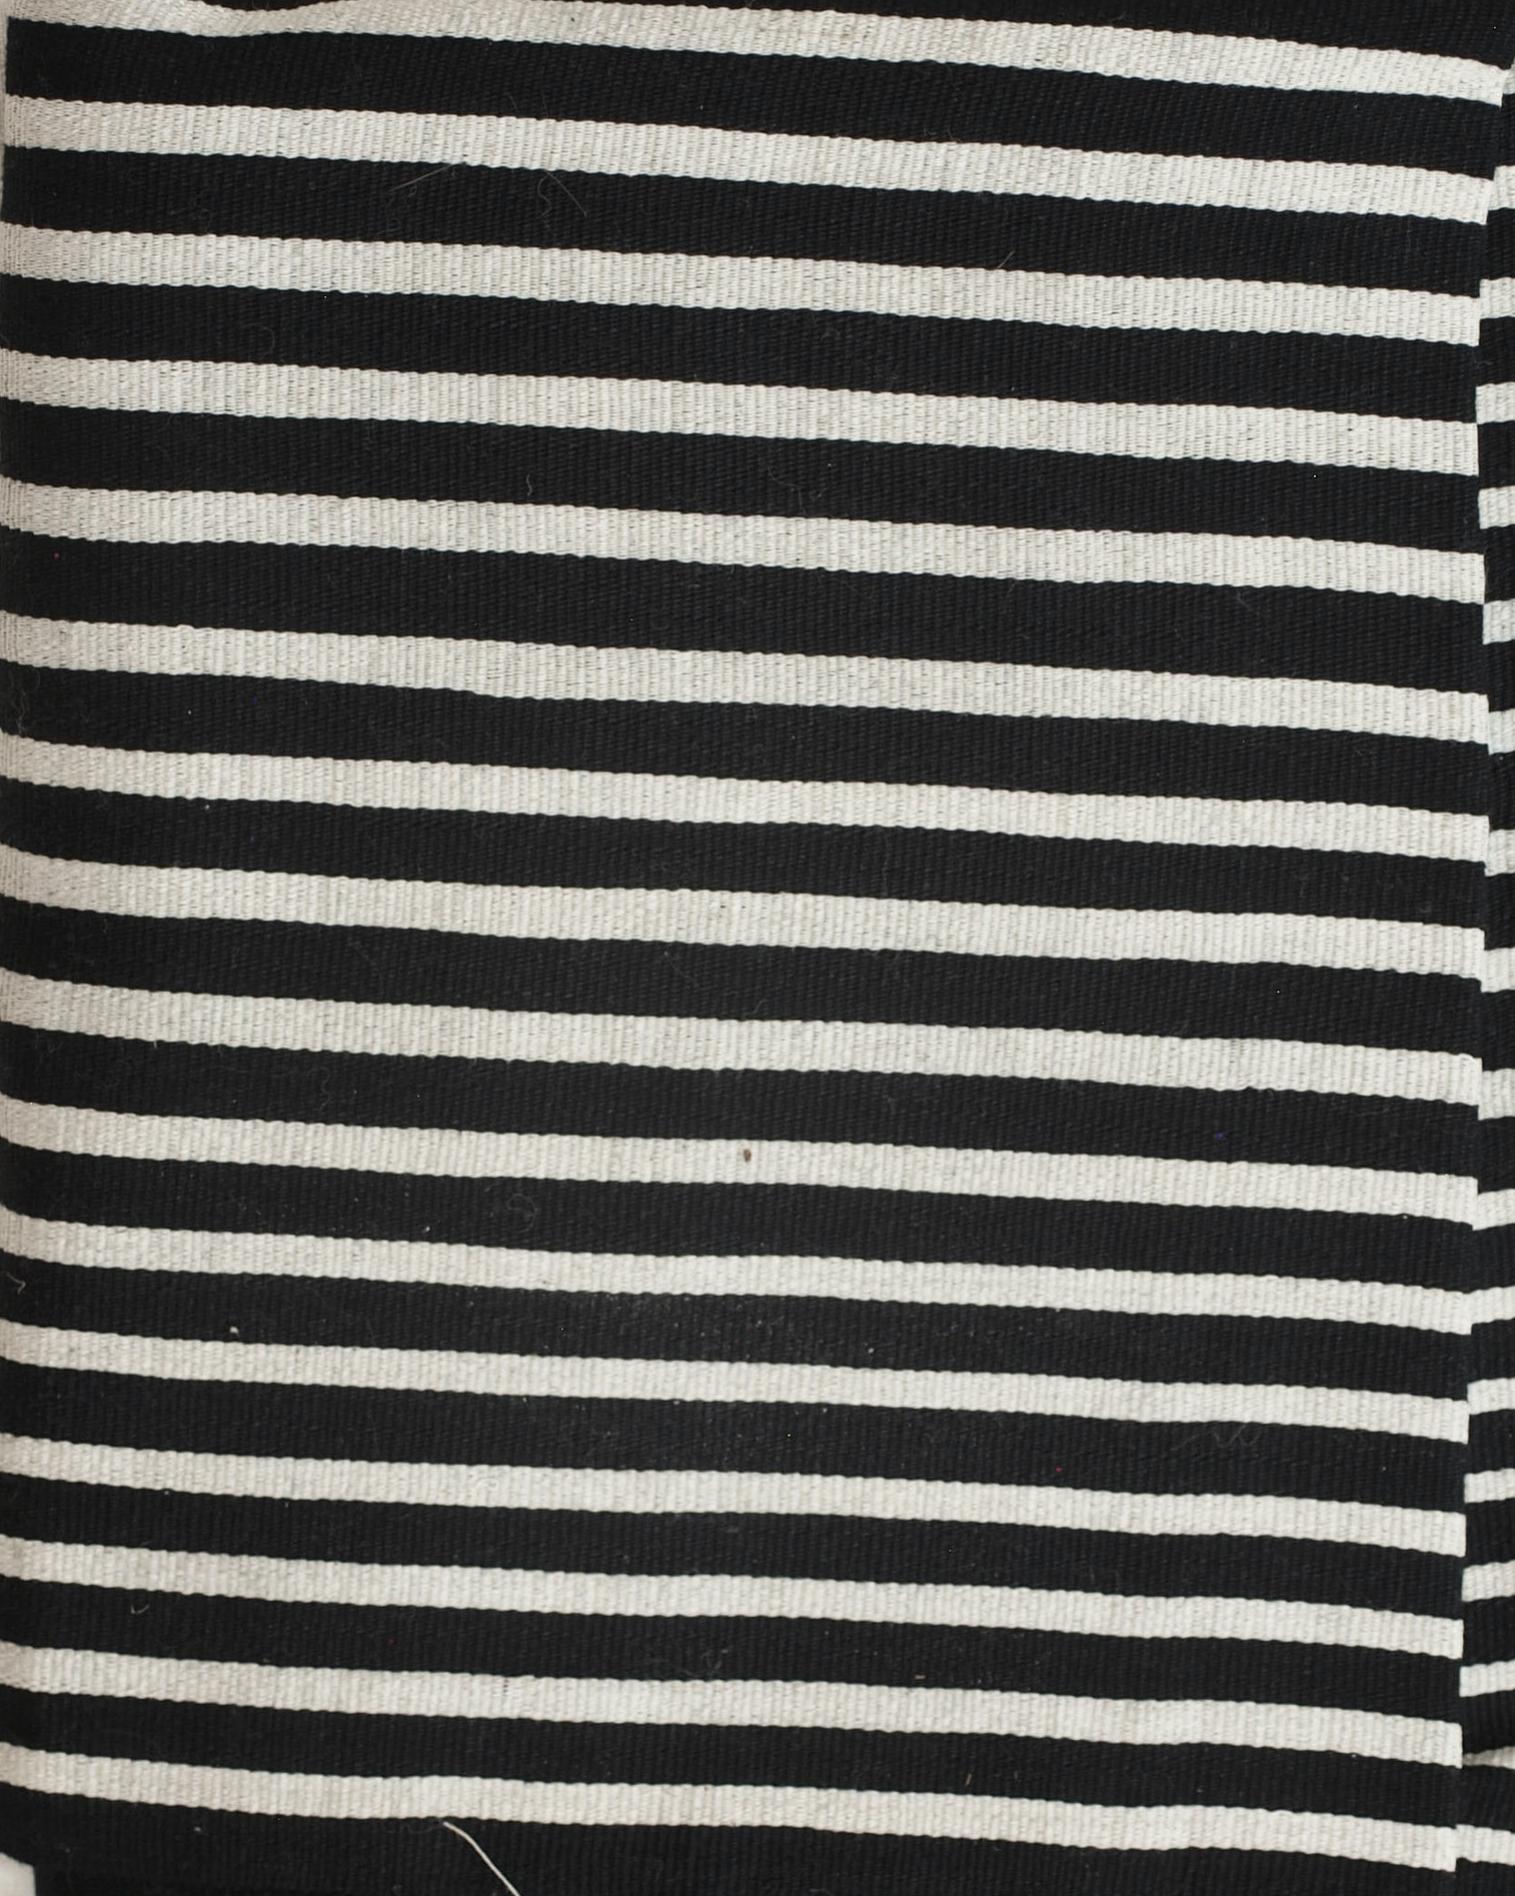 handa_textiles - 4.jpg